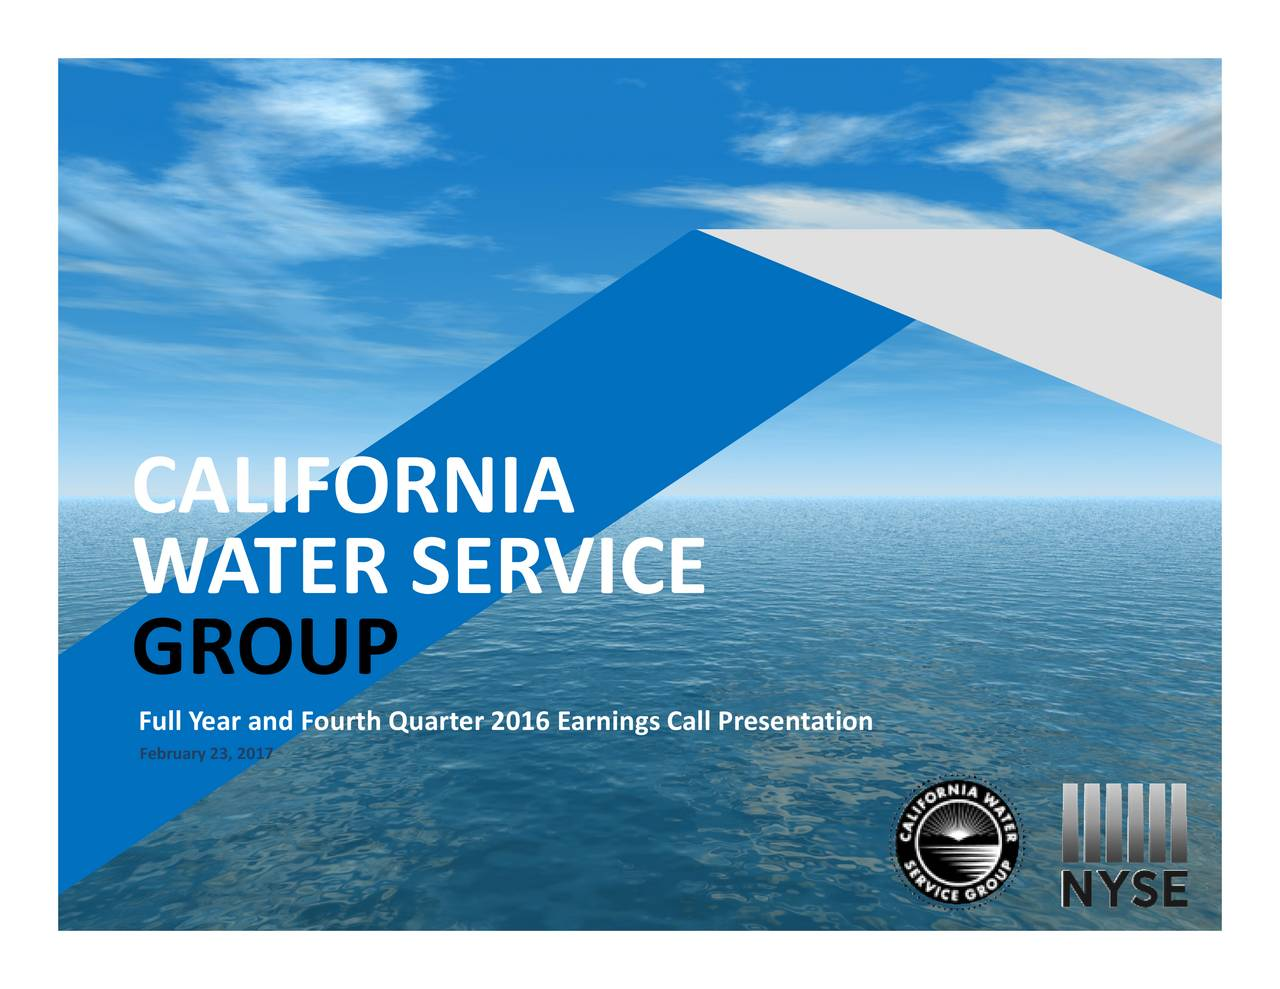 WA TER SERVICE GROUP February 23, 2017rth Quarter 2016 Earnings Call Presentation 1 I